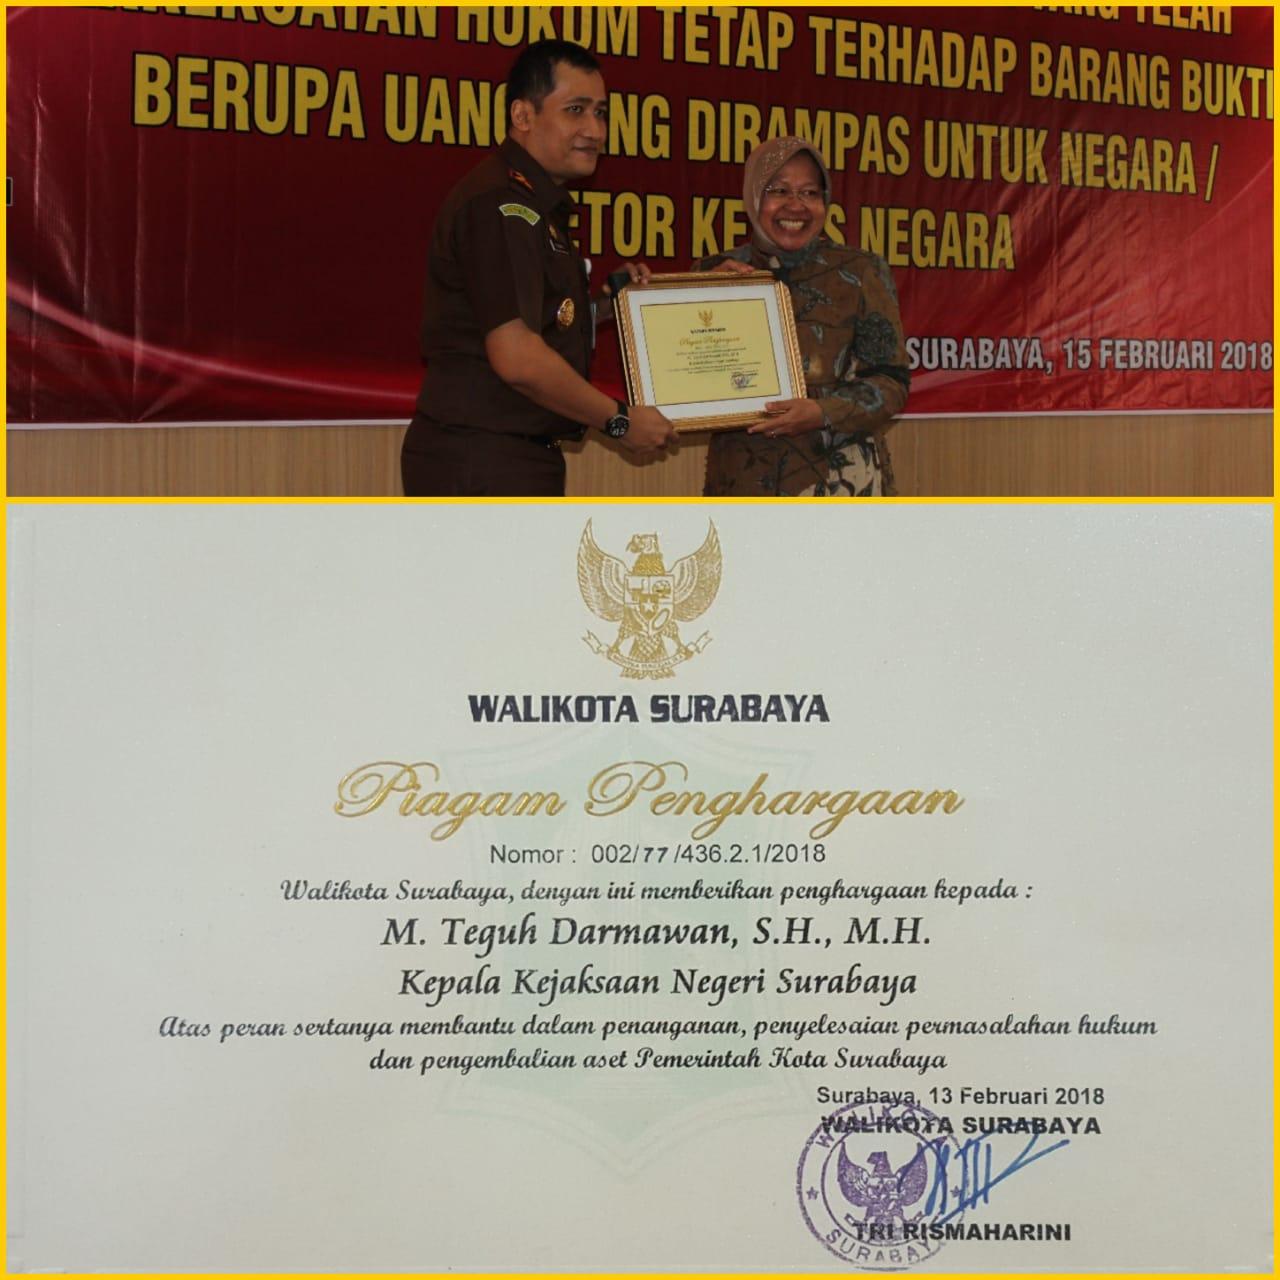 Kajari Surabaya Menerima Penghargaan Dari Walikota Surabaya 15-02-2018